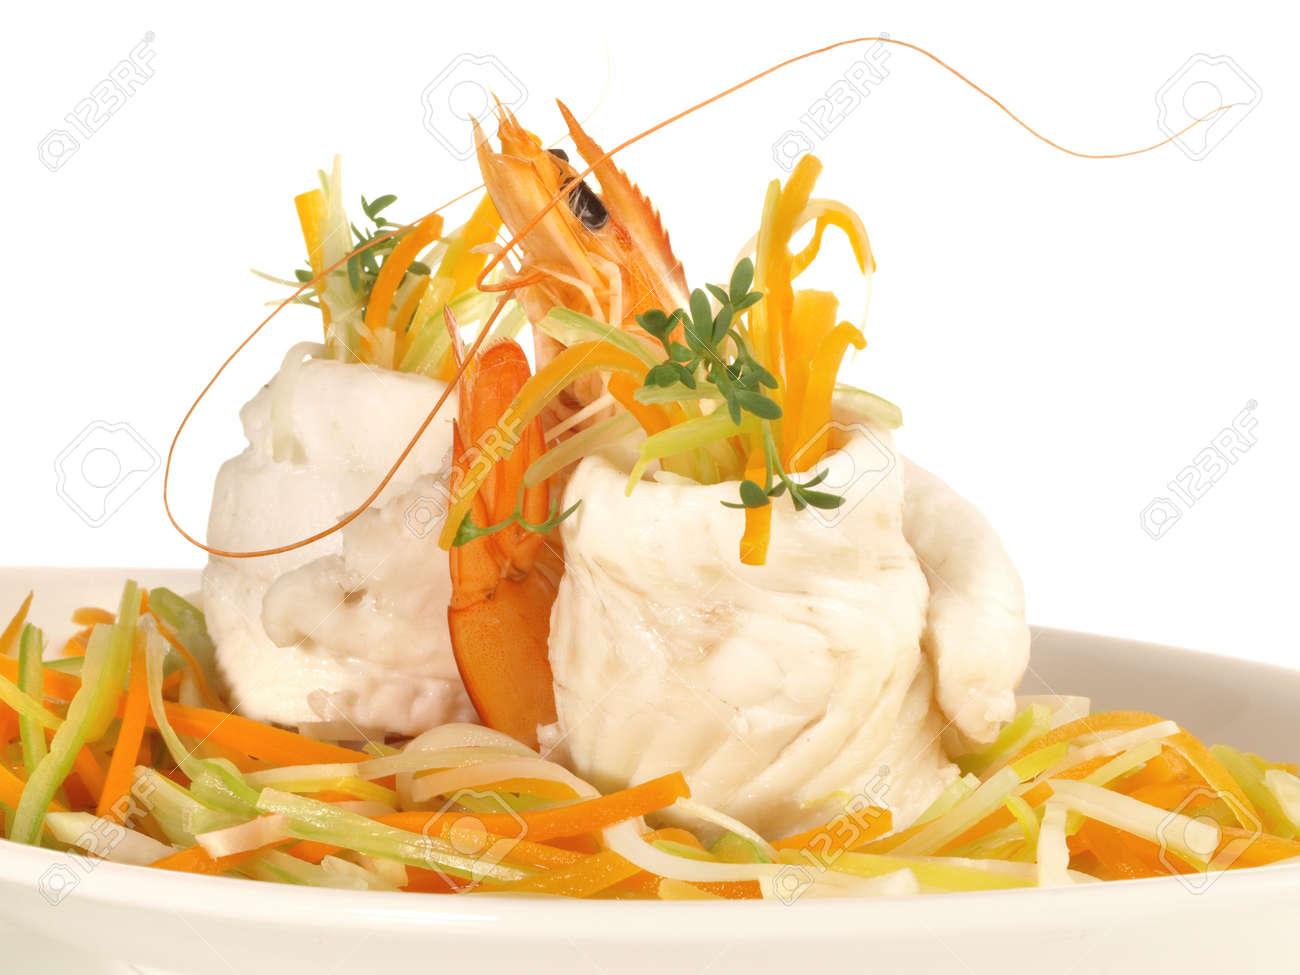 Sole Fillet Rolls - Flatfish on white background - 165075569